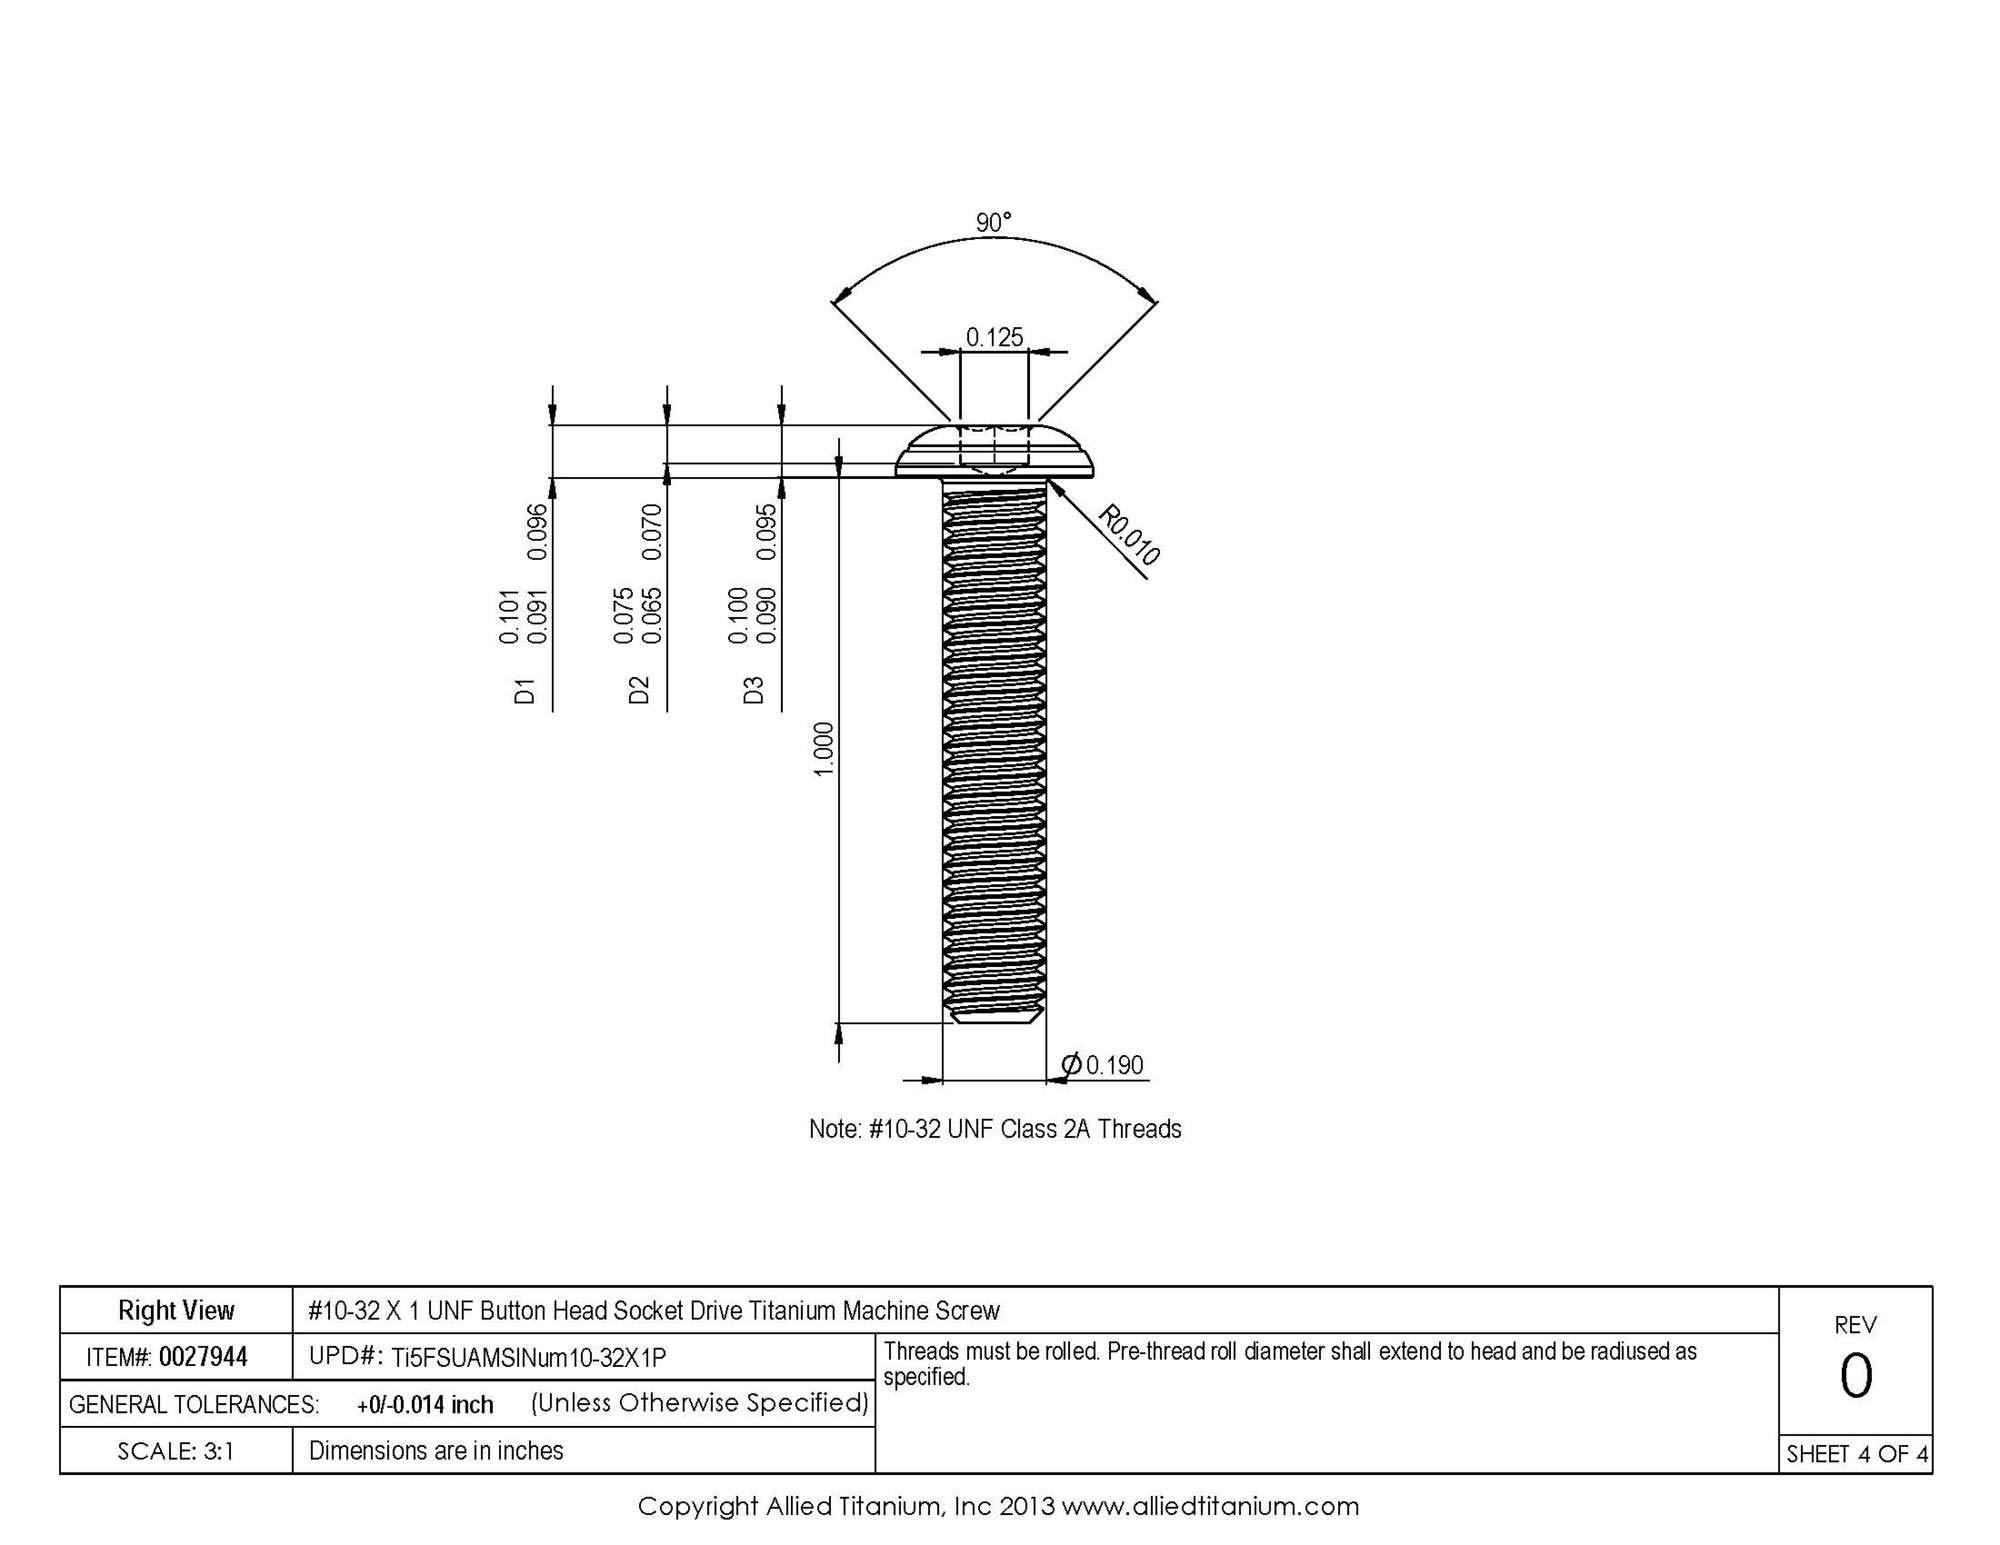 Allied Titanium 0027944, (Pack of 10) #10-32 X 1 UNF Button Head Socket Drive Machine Screw, Grade 5 (Ti-6Al-4V) by Allied Titanium (Image #4)